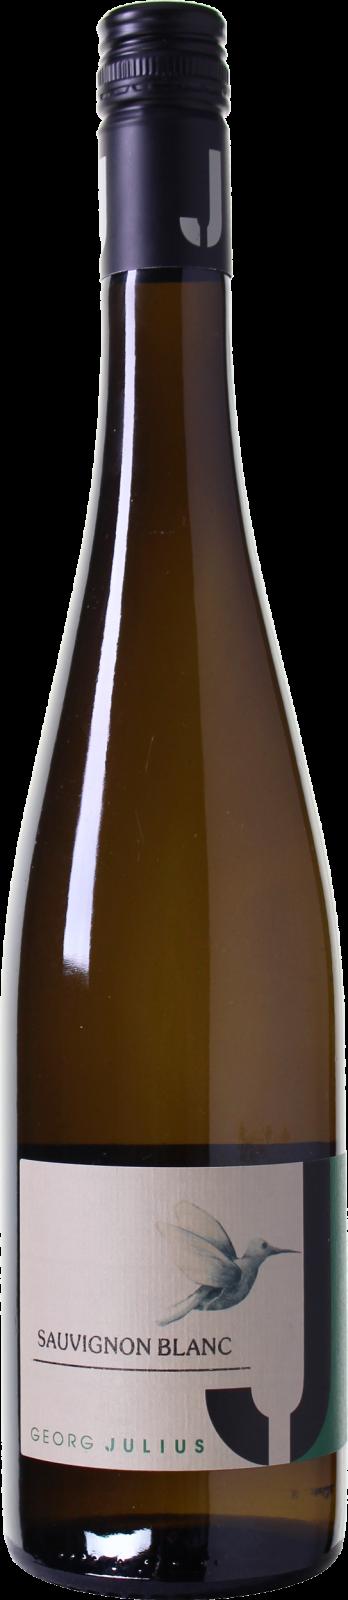 Georg Julius Sauvignon Blanc (Organic)